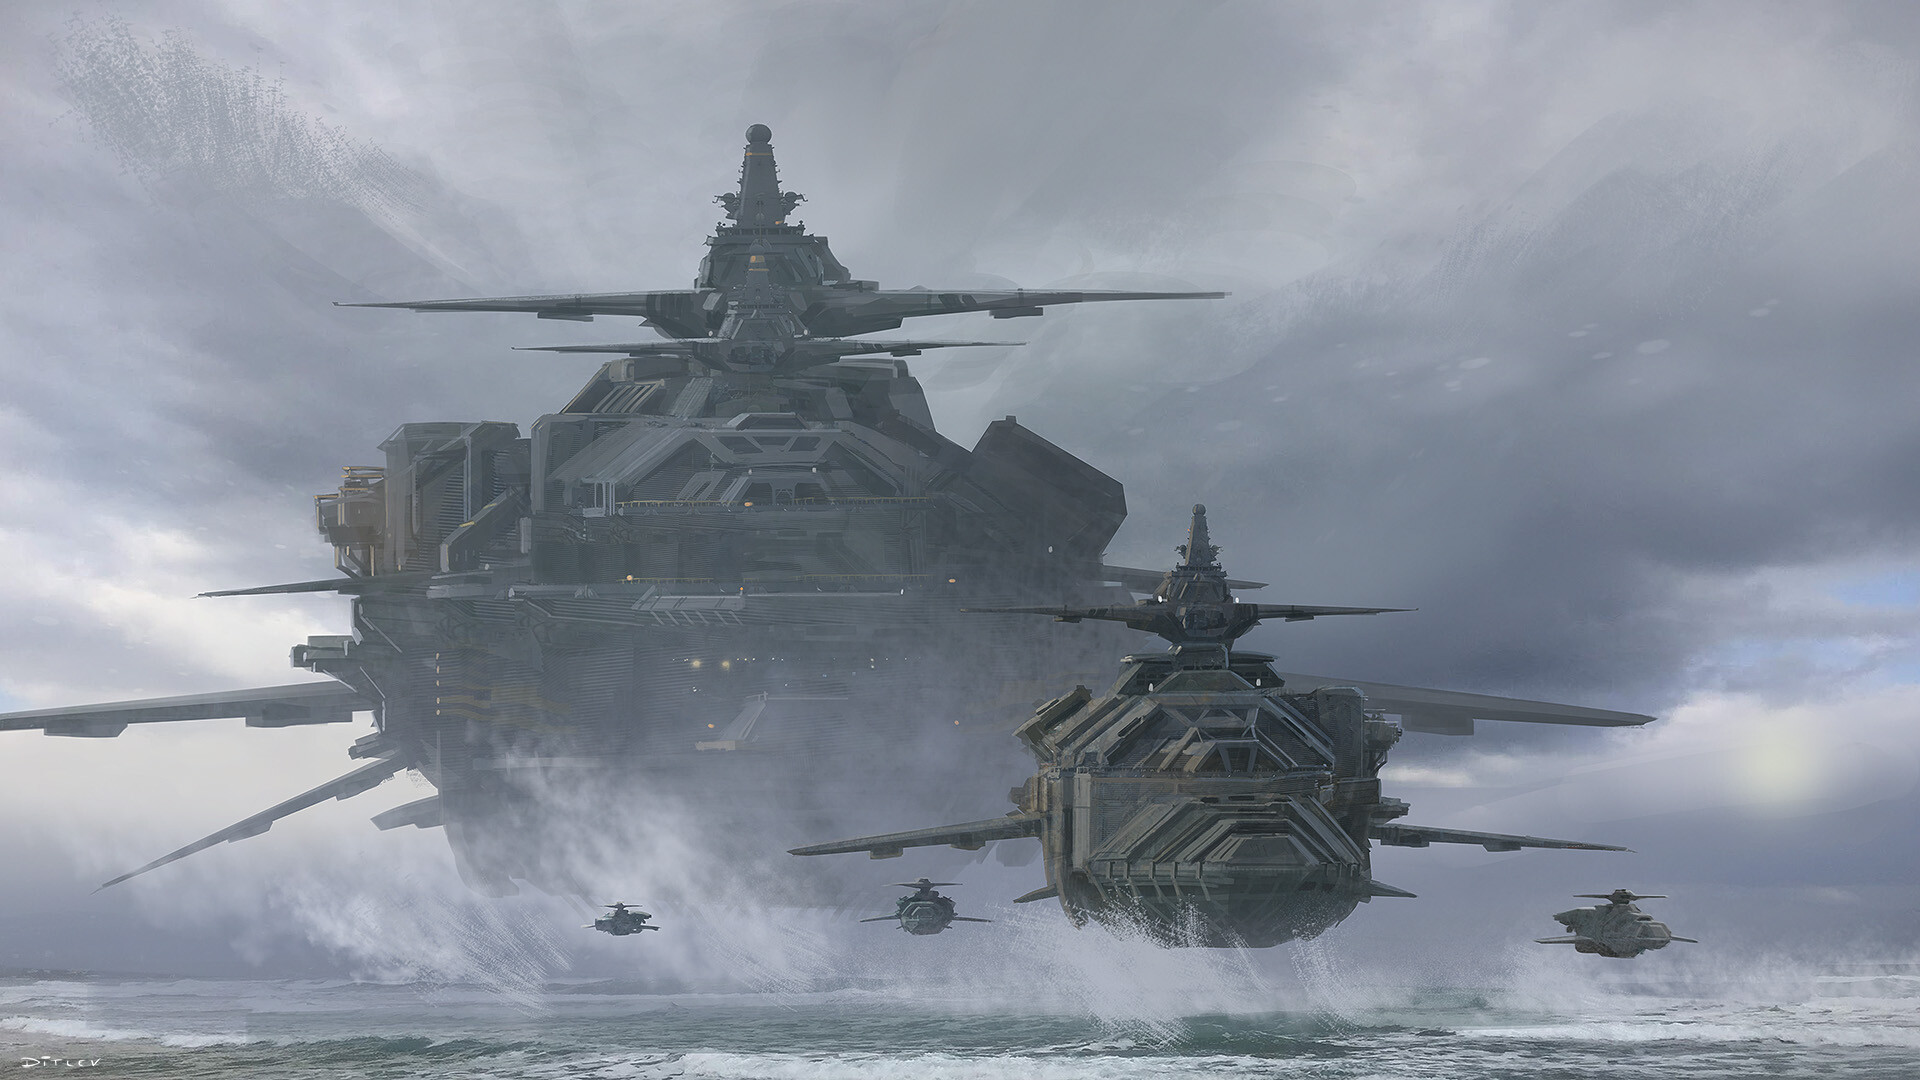 Battleship 1920x1080